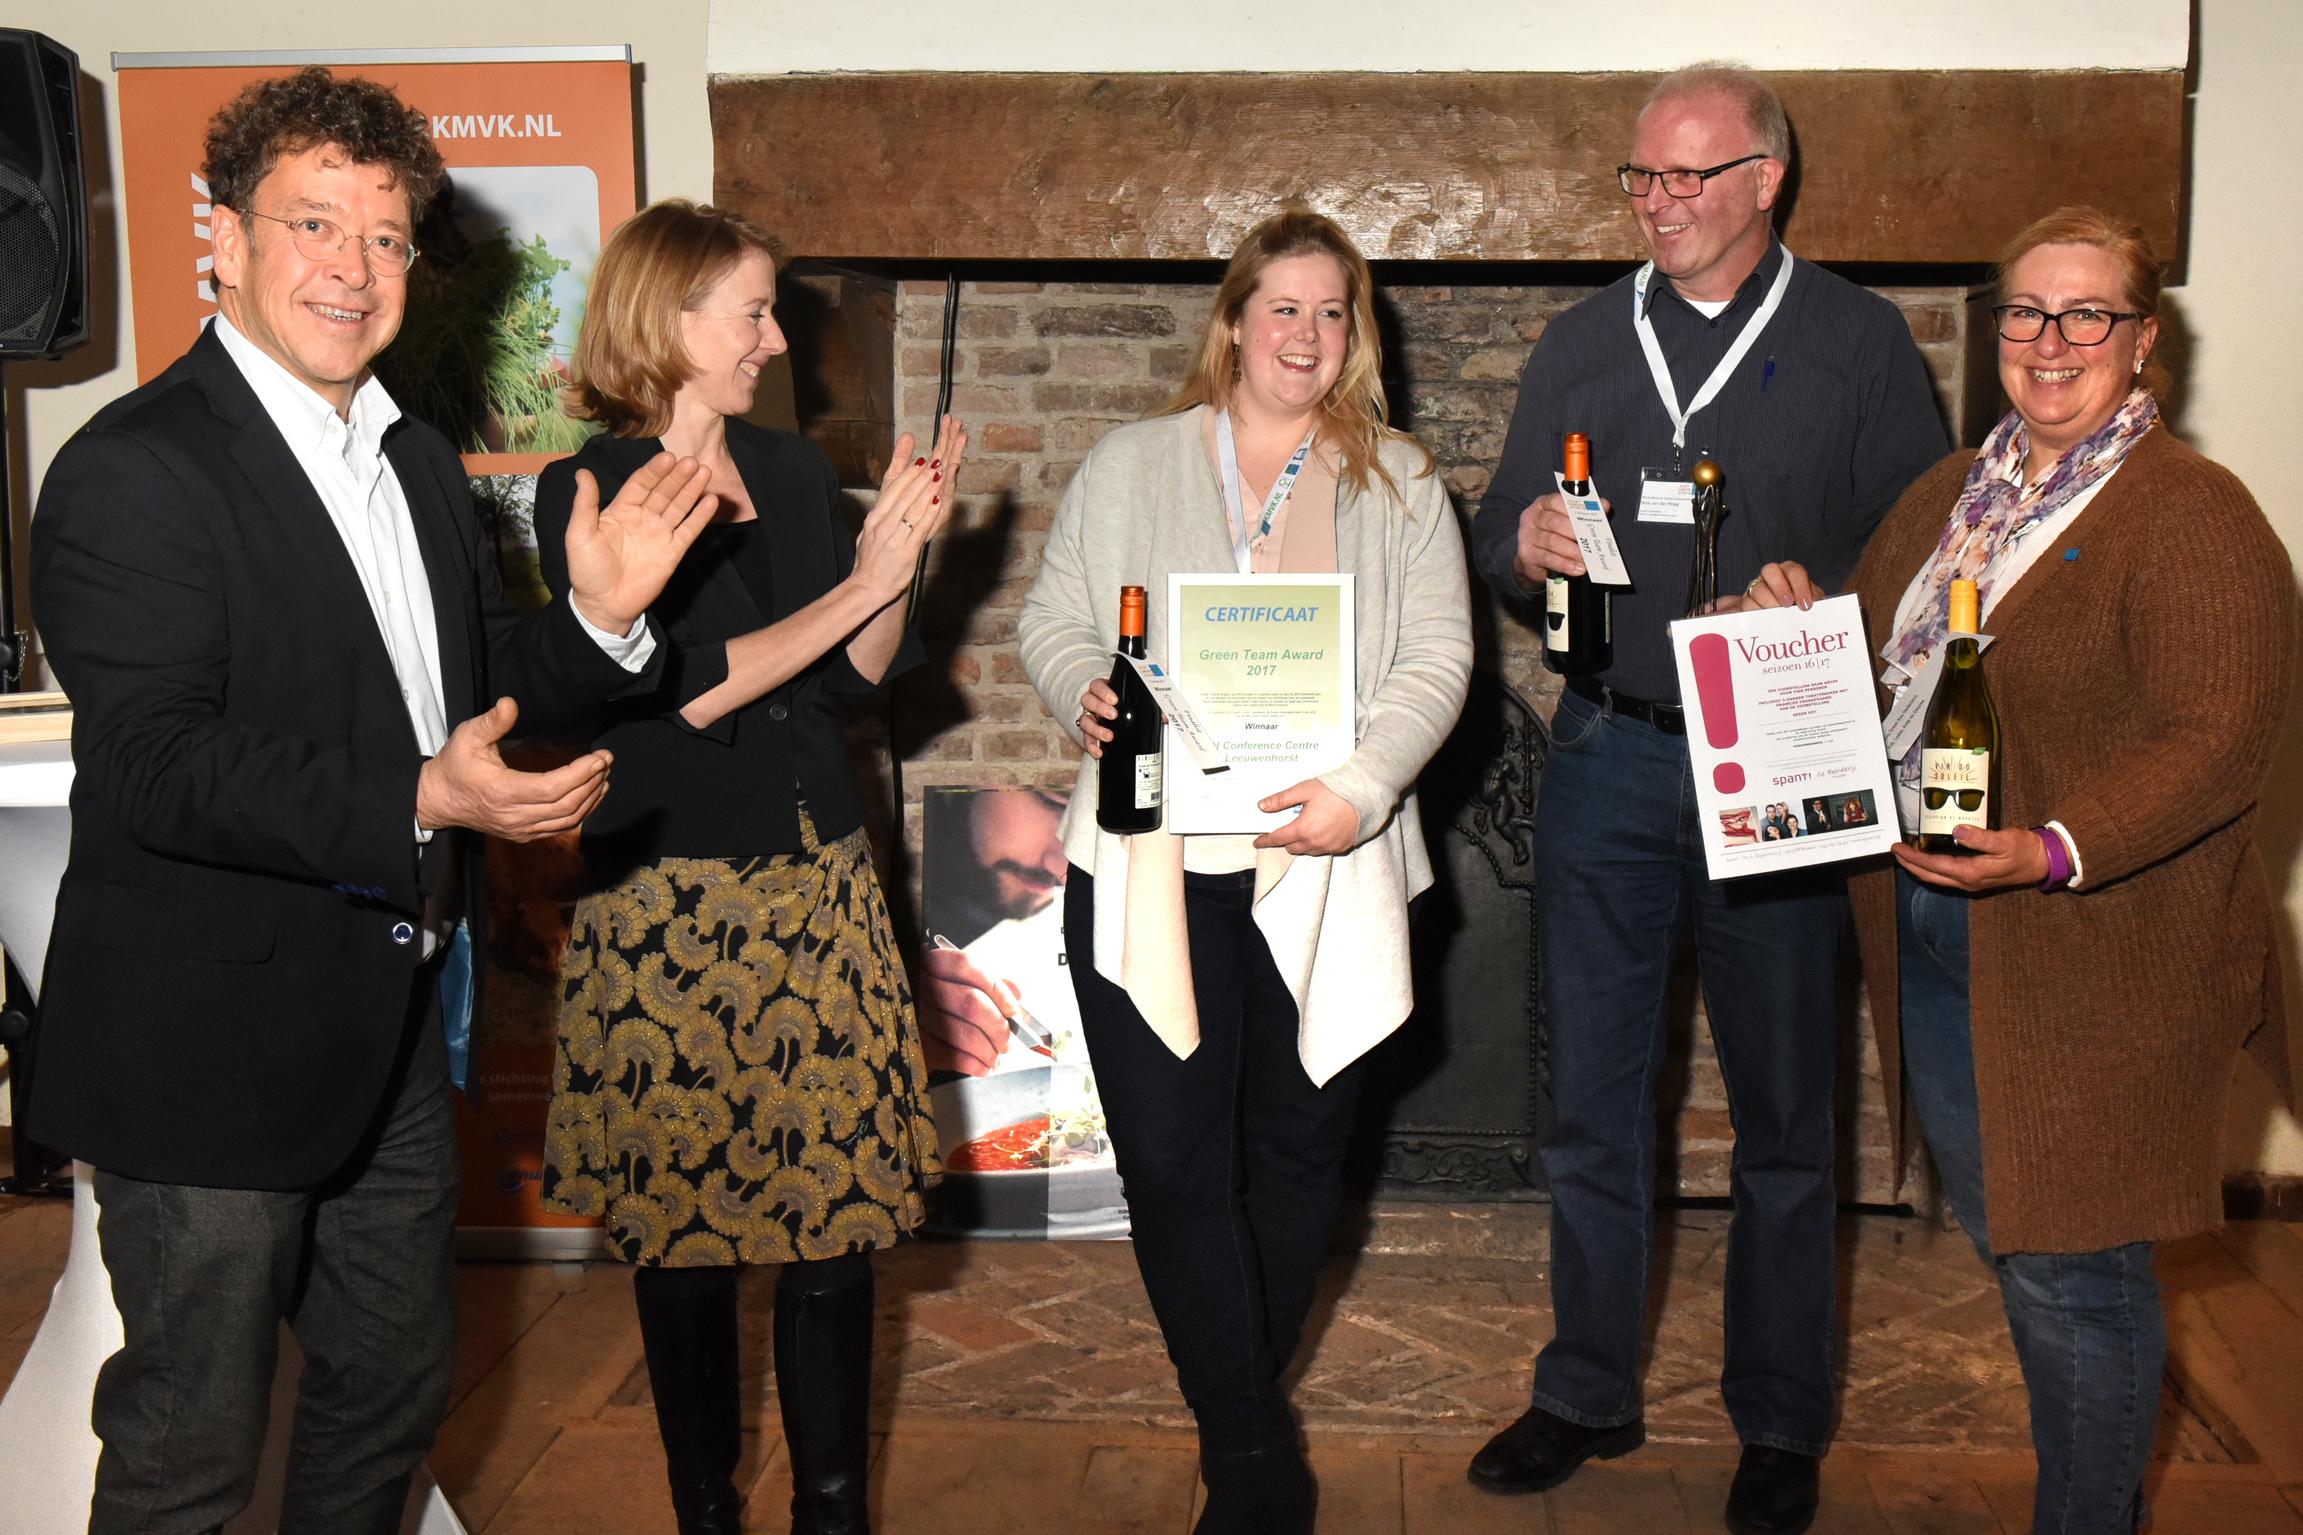 Winners of the Green Team Award 2017: NH Leeuwenhorst congratulated by Mr. Erik van Dijk (Dutch Green Key coordinator) and Ms. Stientje van Velthoven (member of the Dutch Parliament)